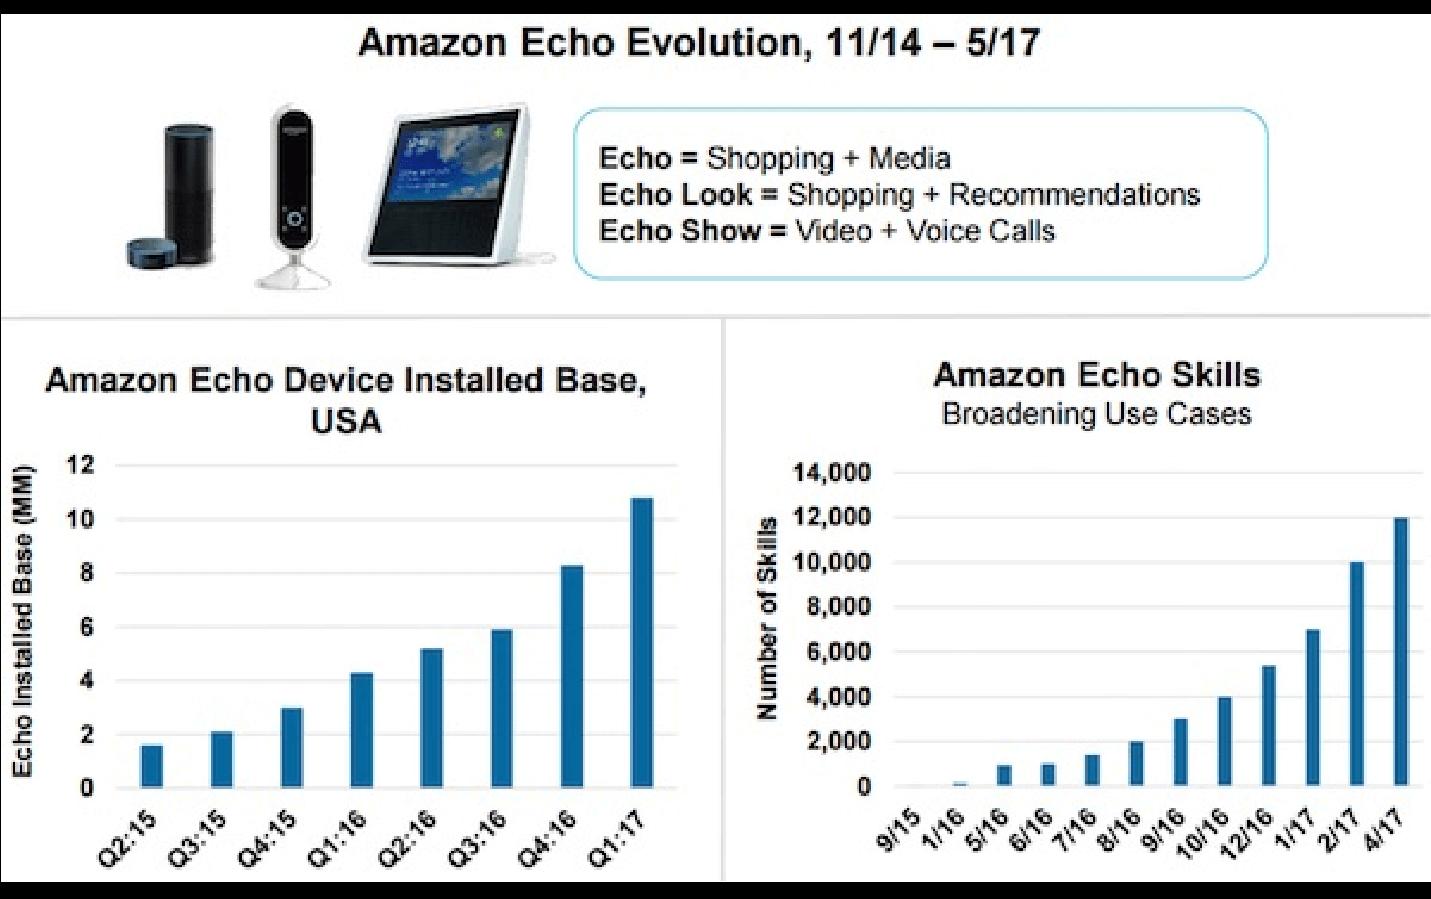 Amazon Echo Evolution